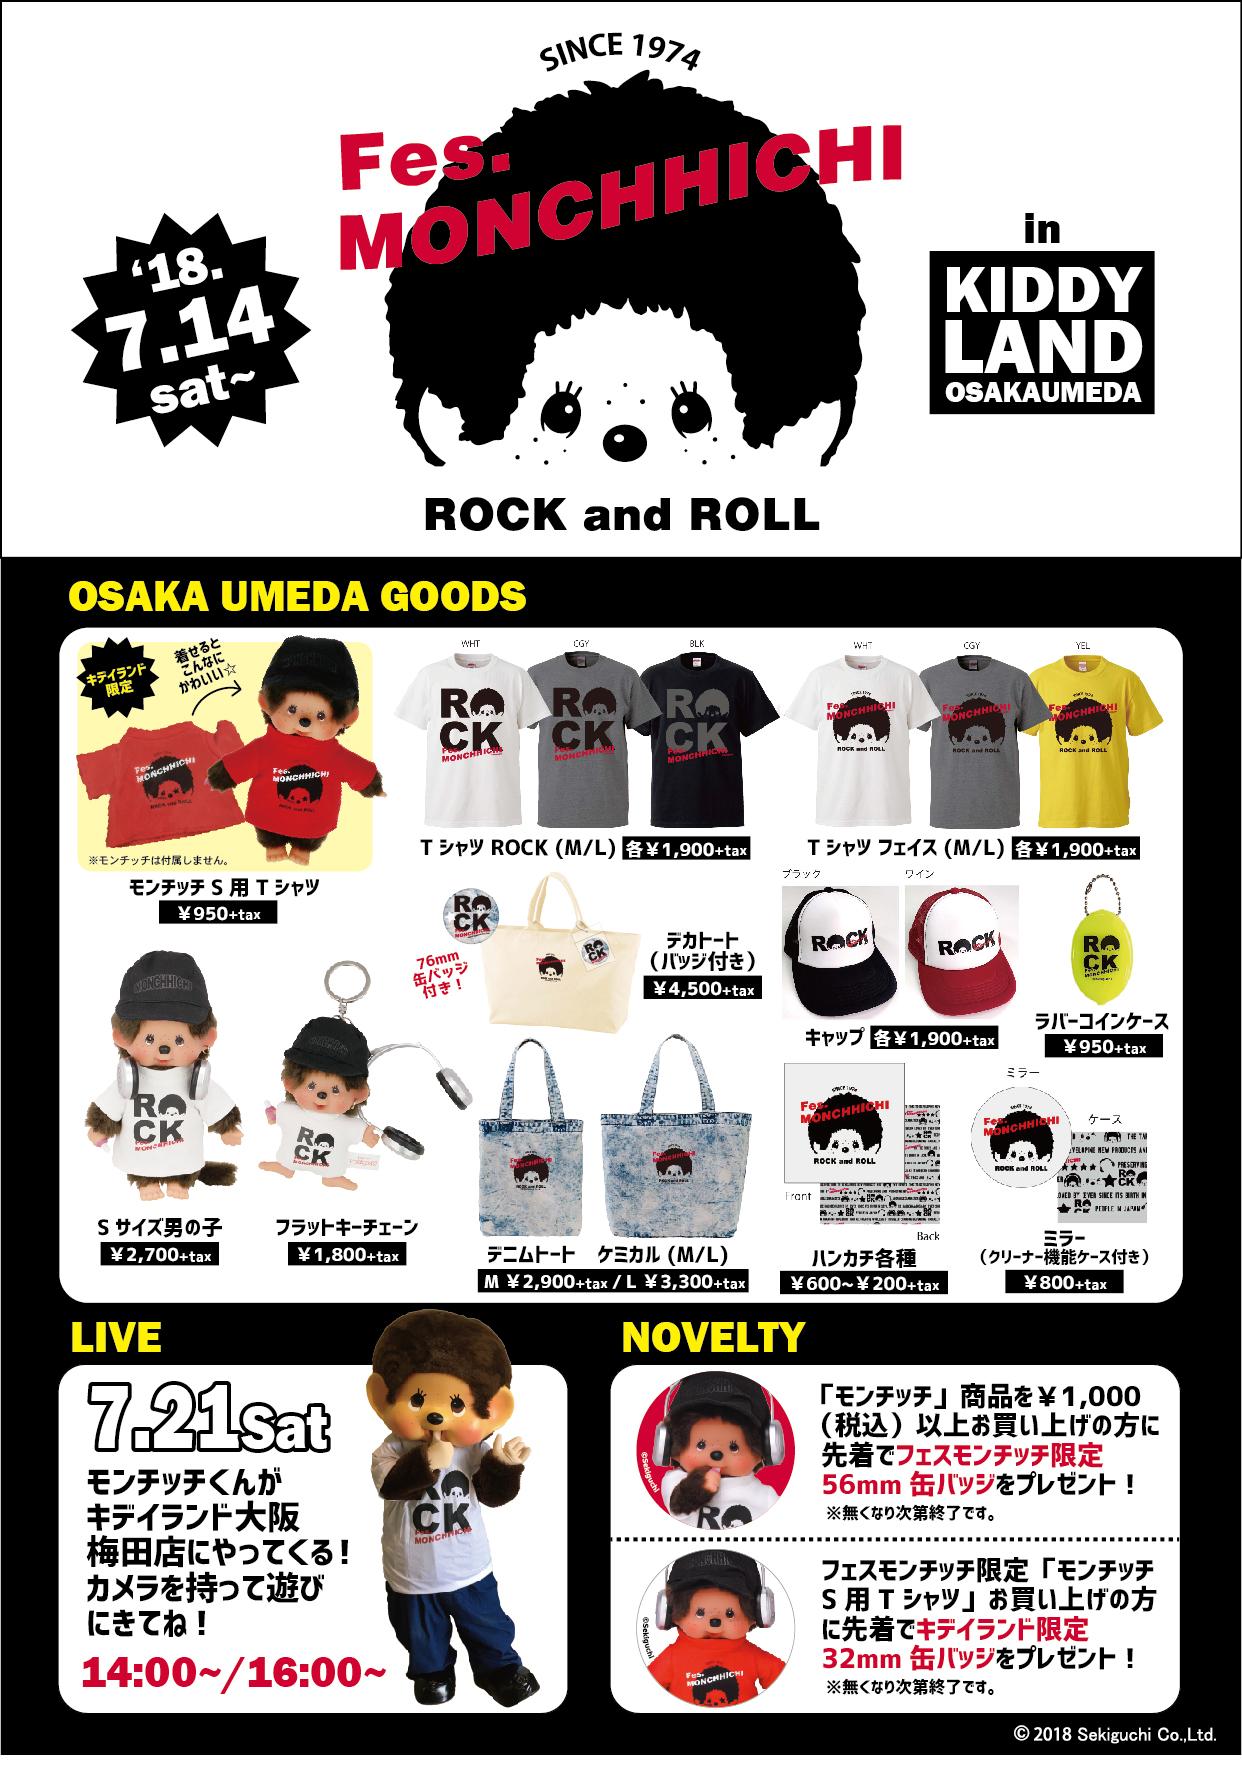 http://www.monchhichi.co.jp/files/news/event/2018july/180714fesmonchhichi.jpg